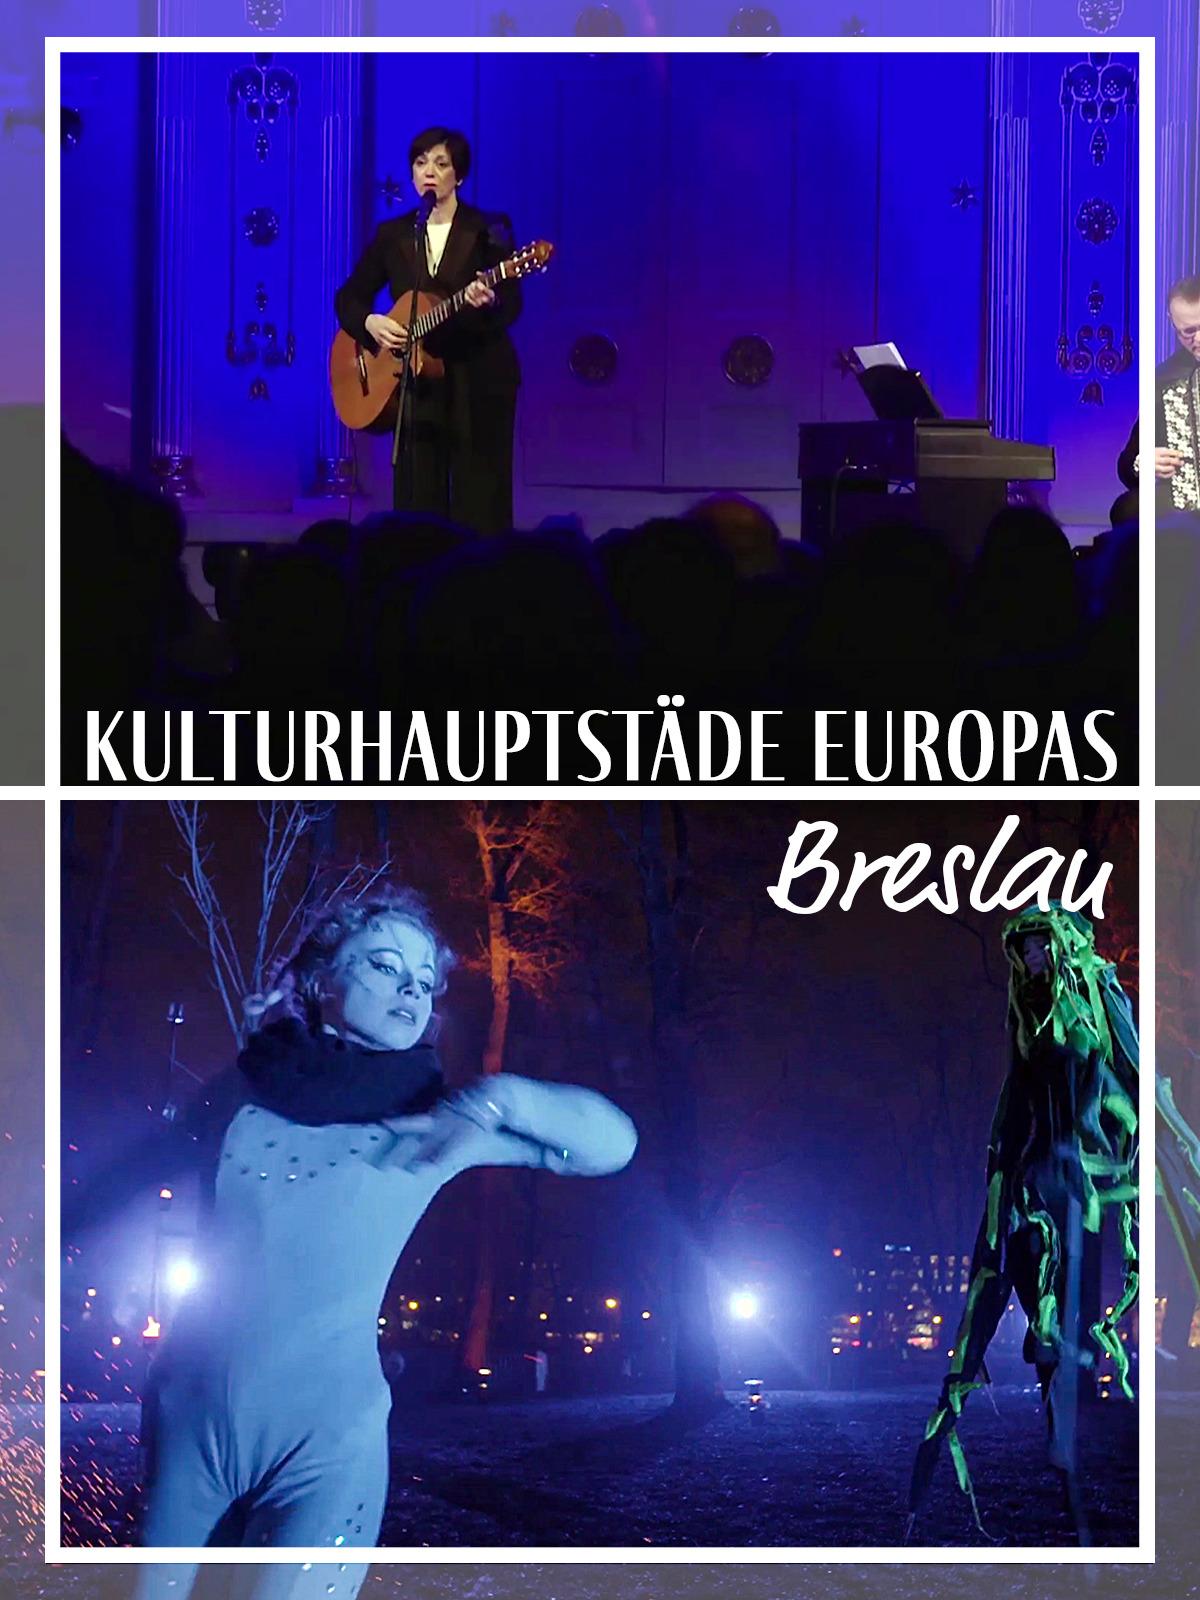 Kulturhauptstädte Europas - Breslau